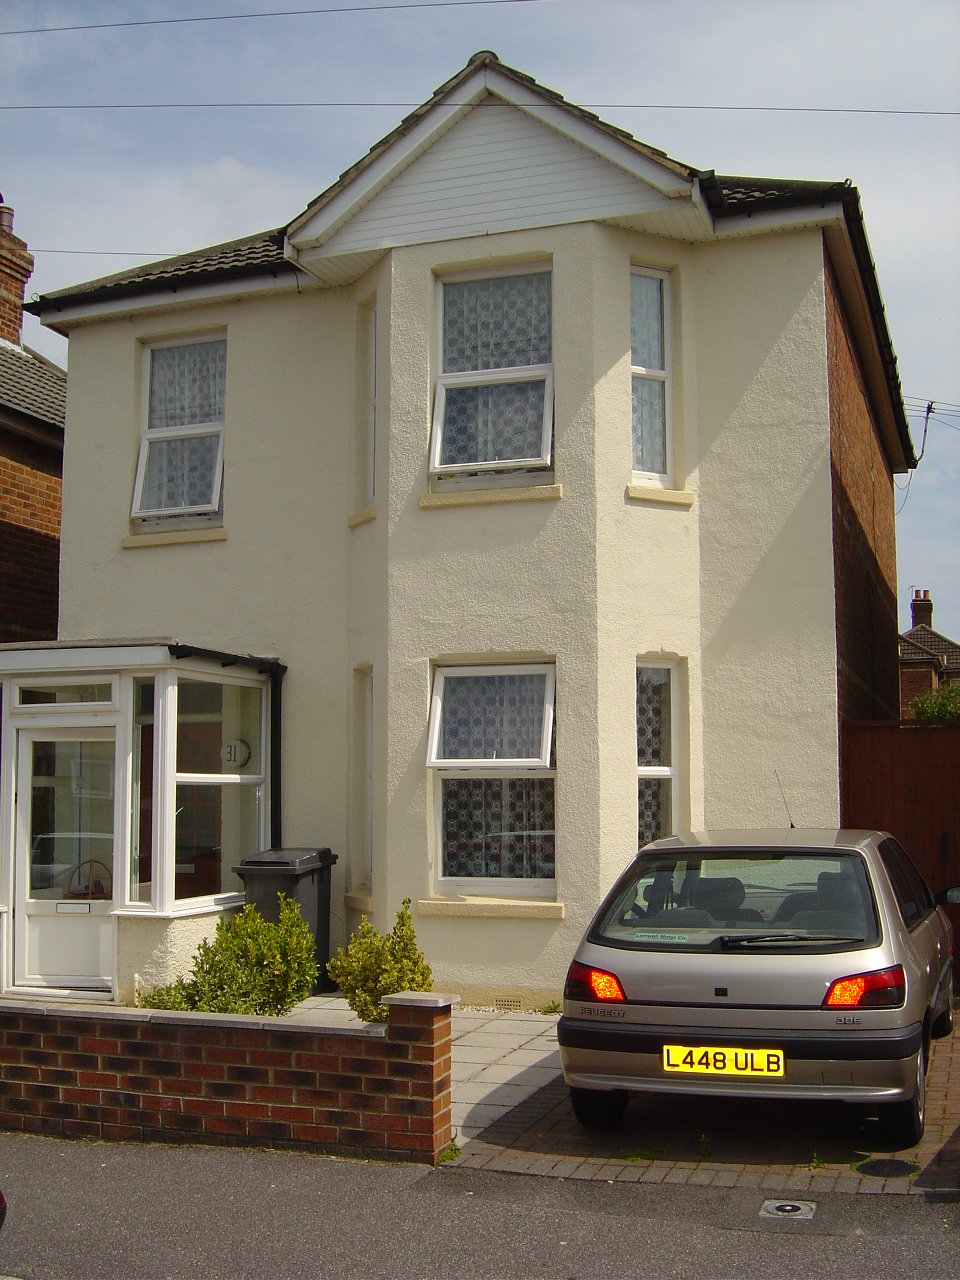 31 Sedgley Road Winton Bournemouth